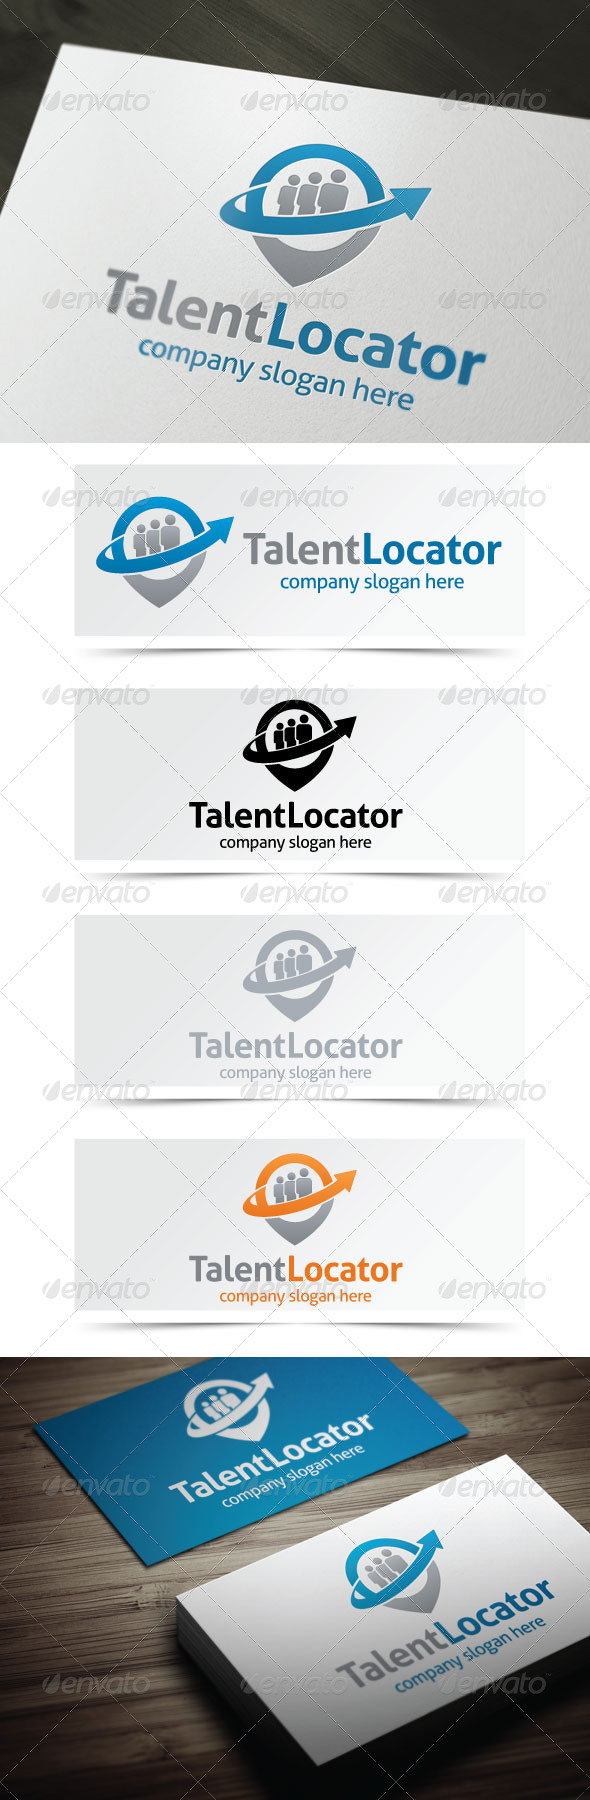 Talent Locator